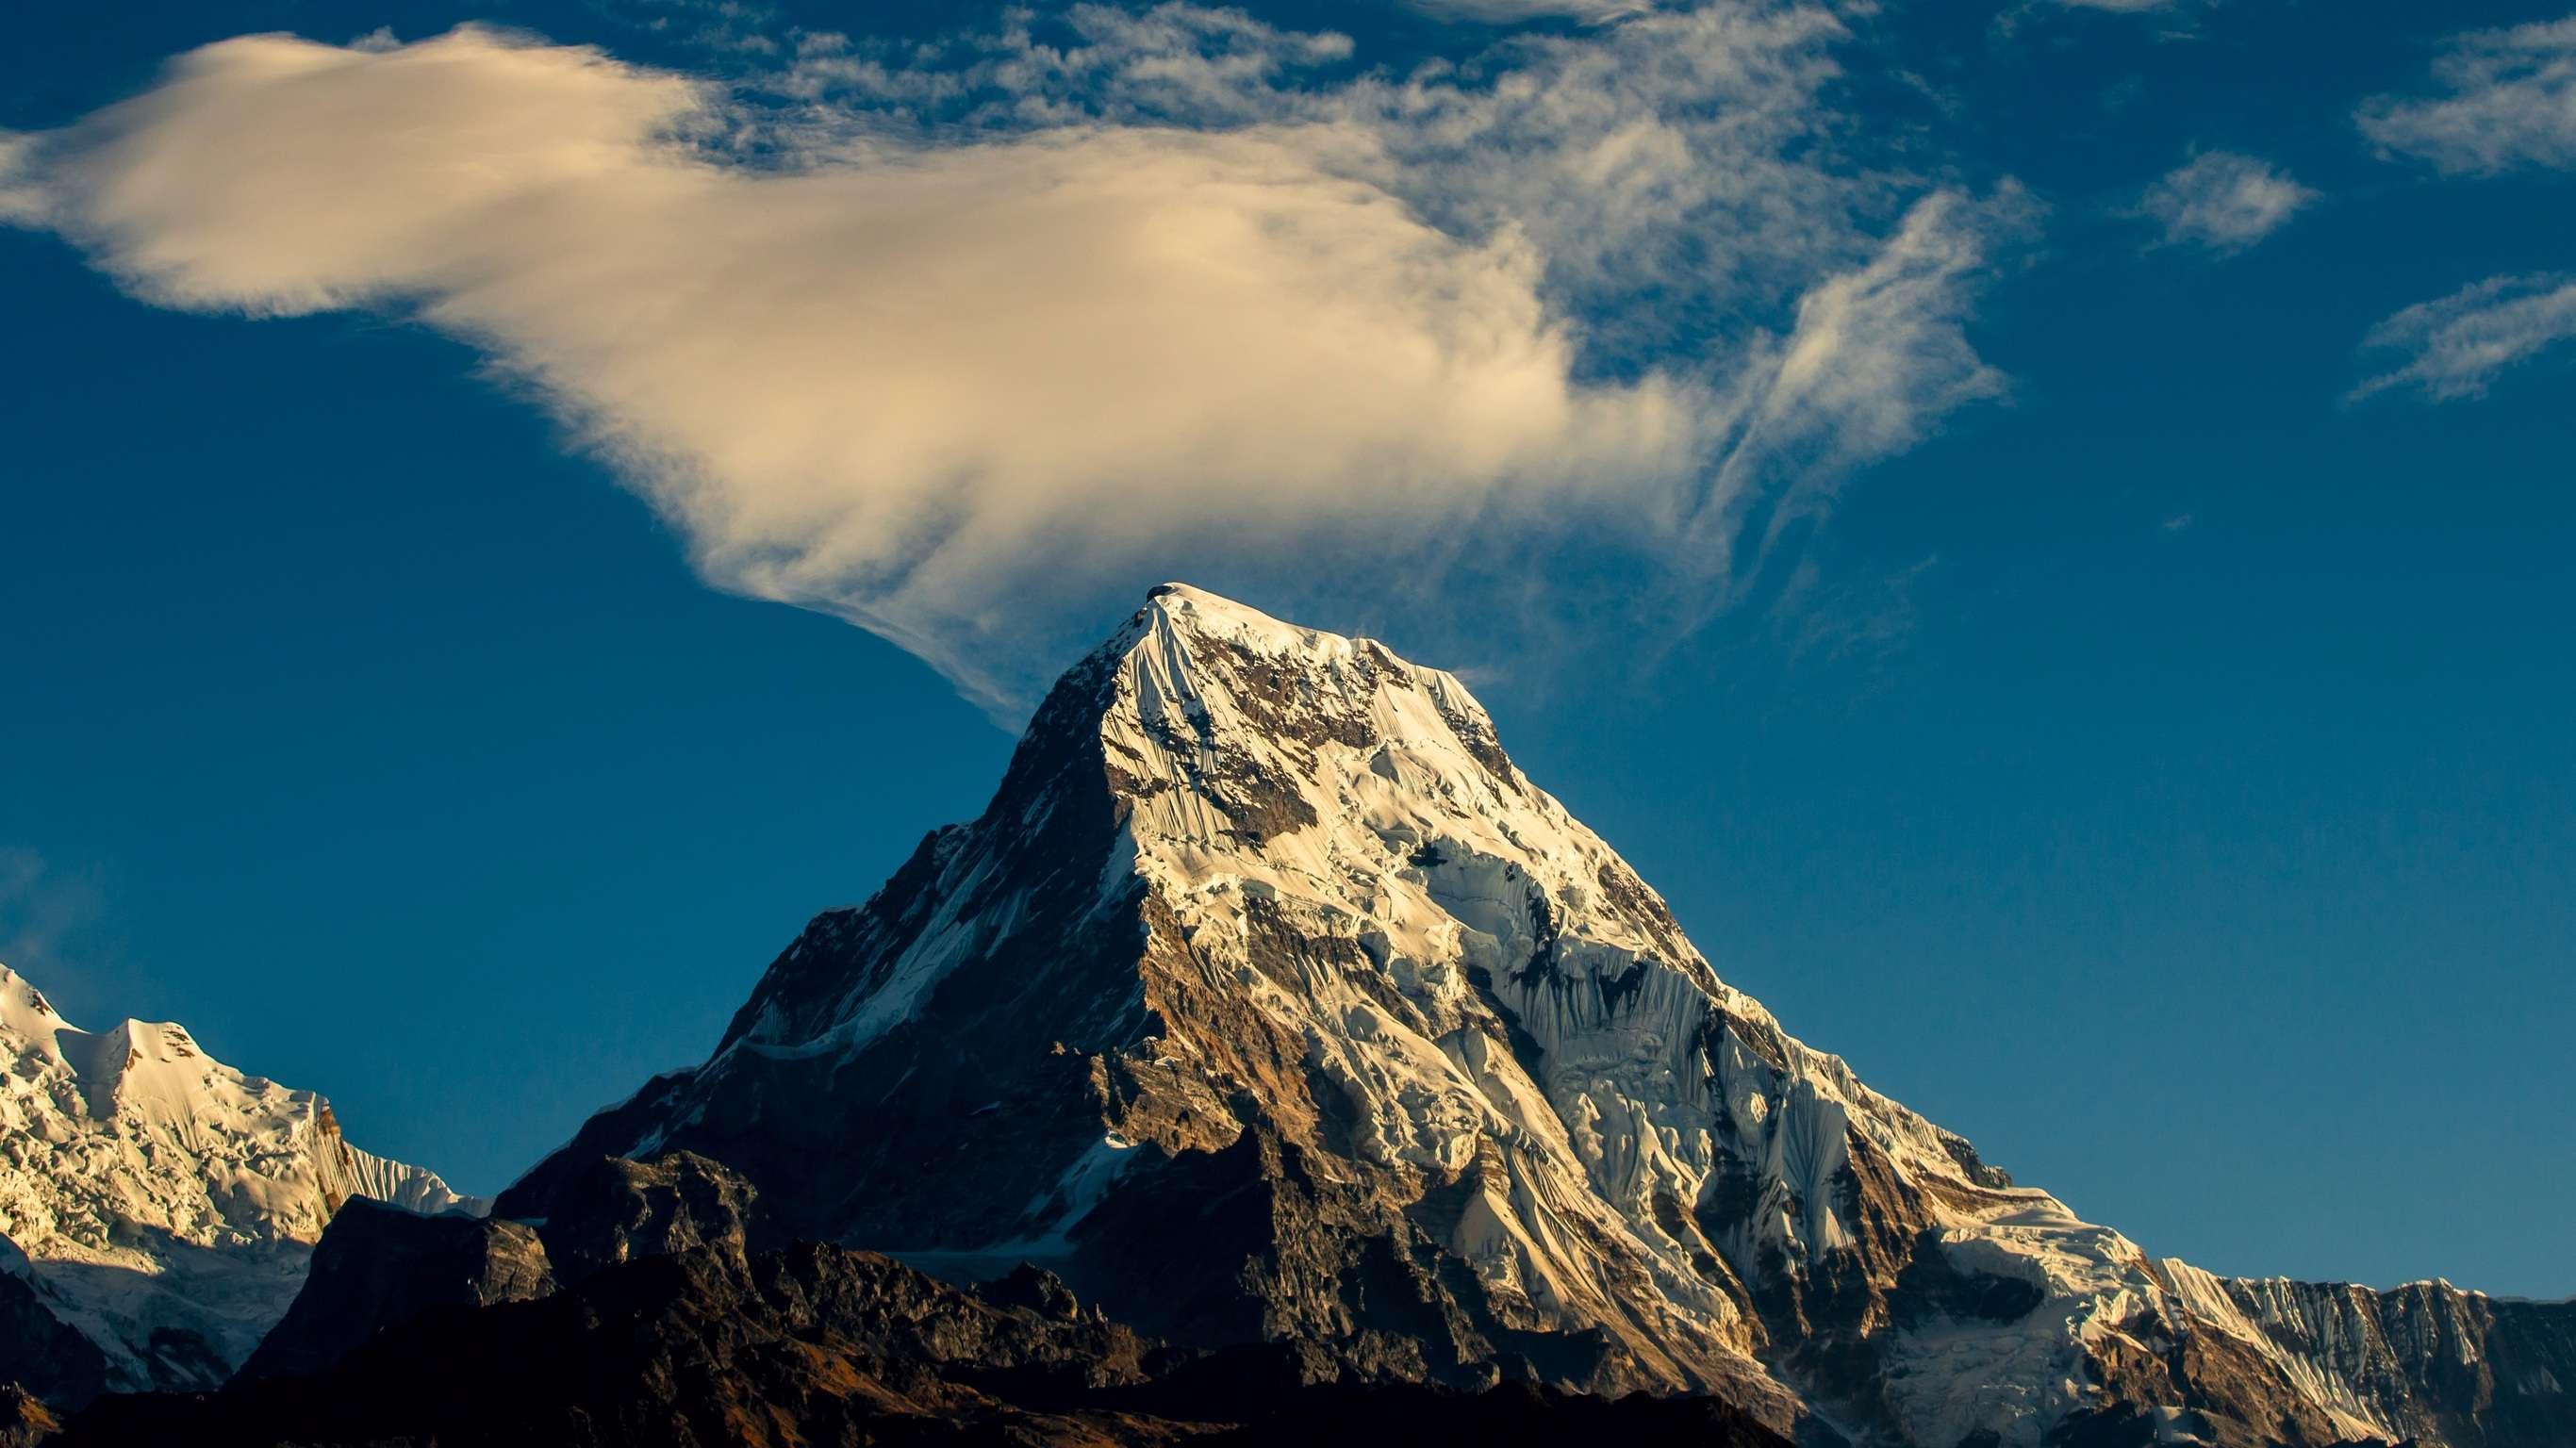 6-Day Poonhill Trek - Nepal Itinerary